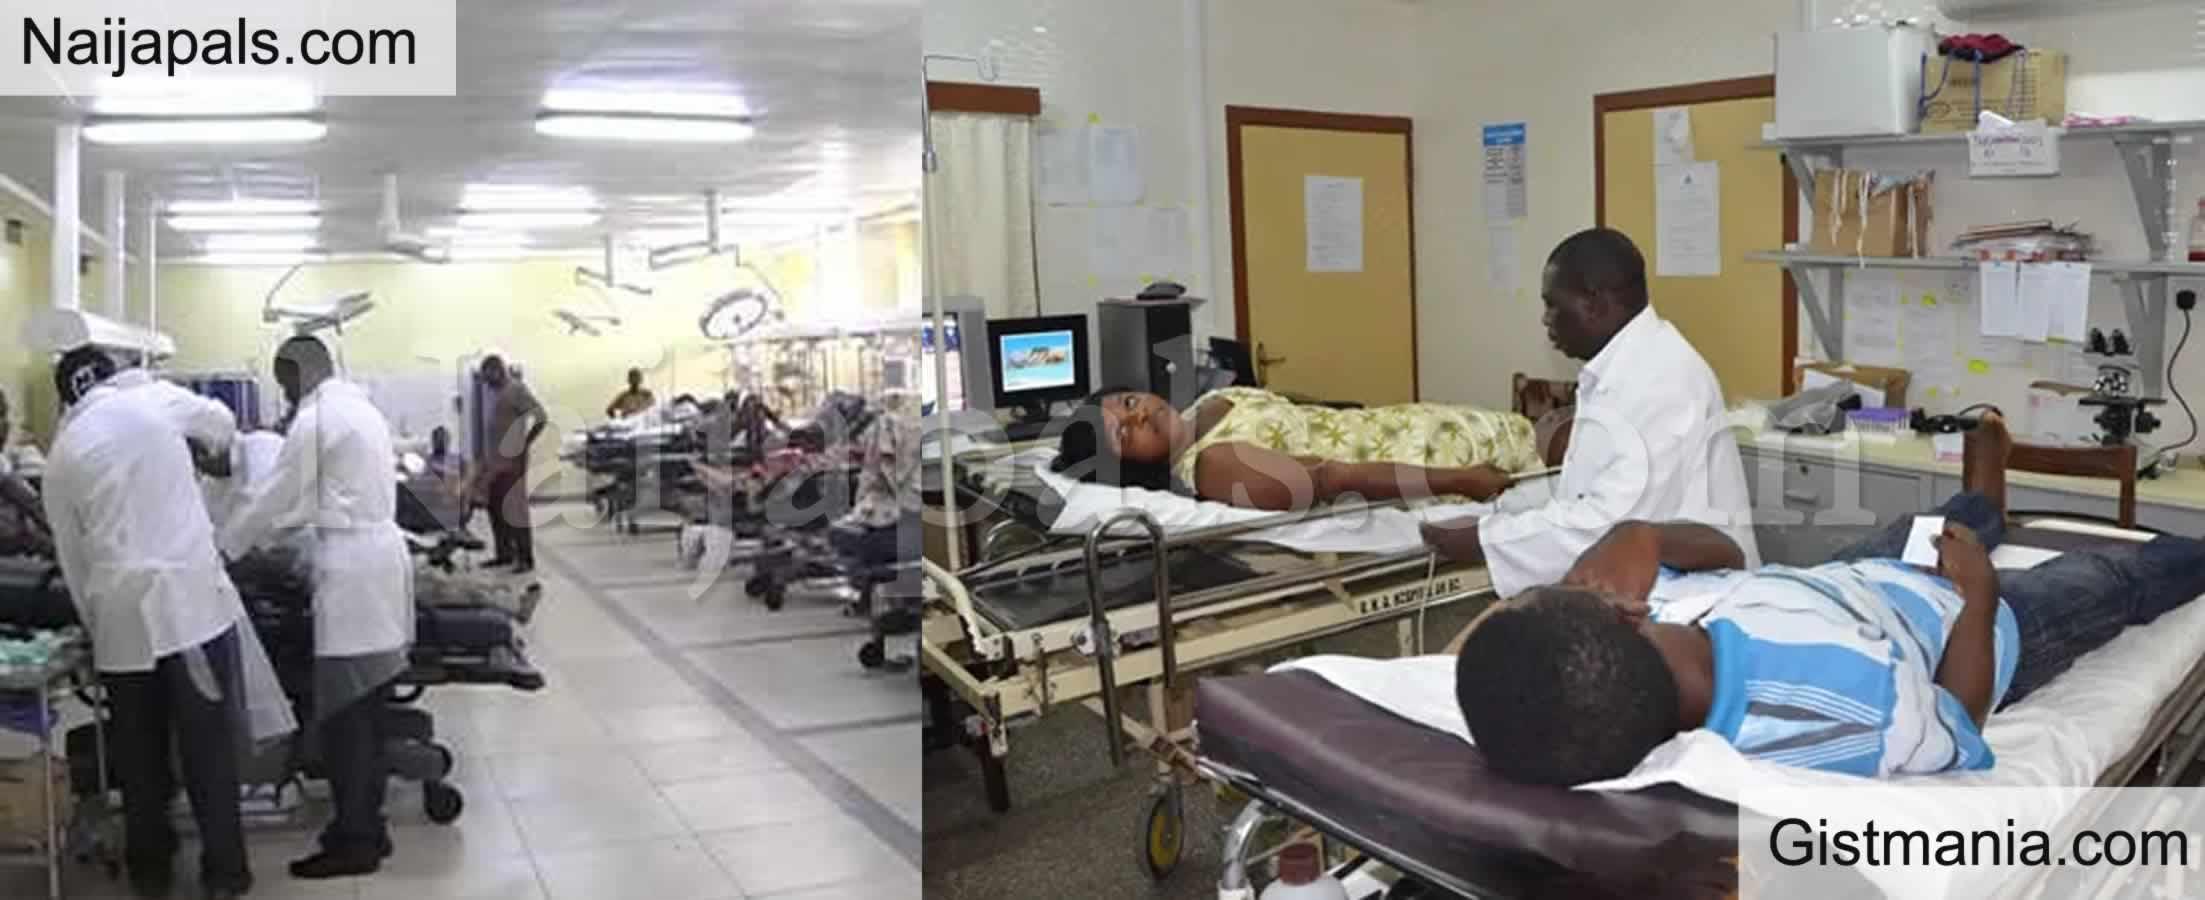 <img alt='.' class='lazyload' data-src='https://img.gistmania.com/emot/news.gif' /> <b>Cholera Breaks Out in Abeokuta, Ogun State Leaving Over 10 Hospitalized & One Dead</b>